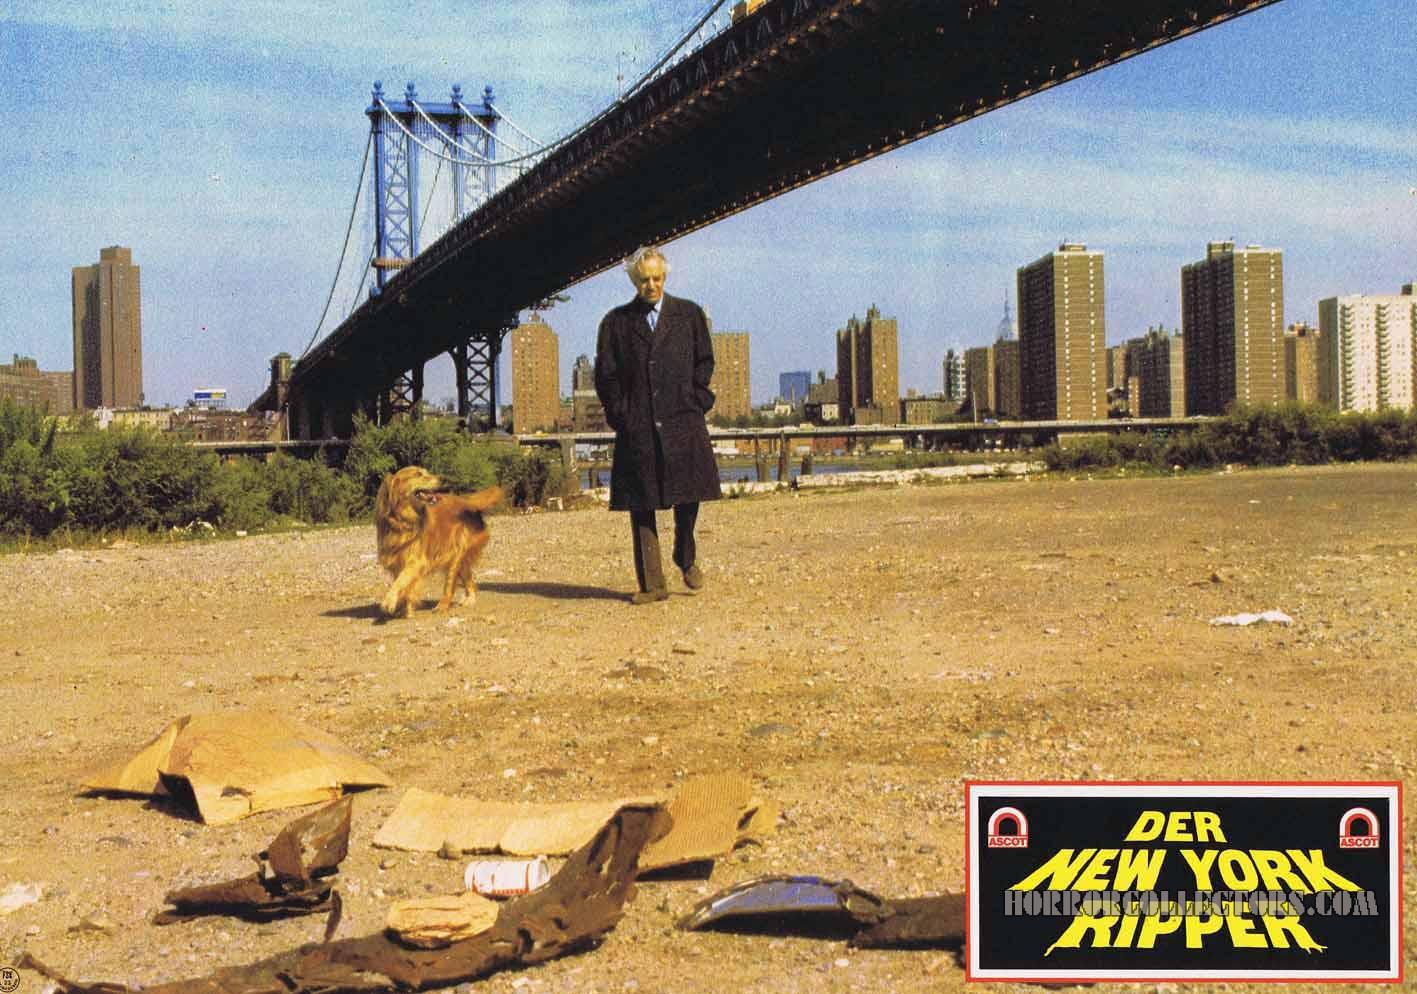 New York Ripper German Lobby Cards